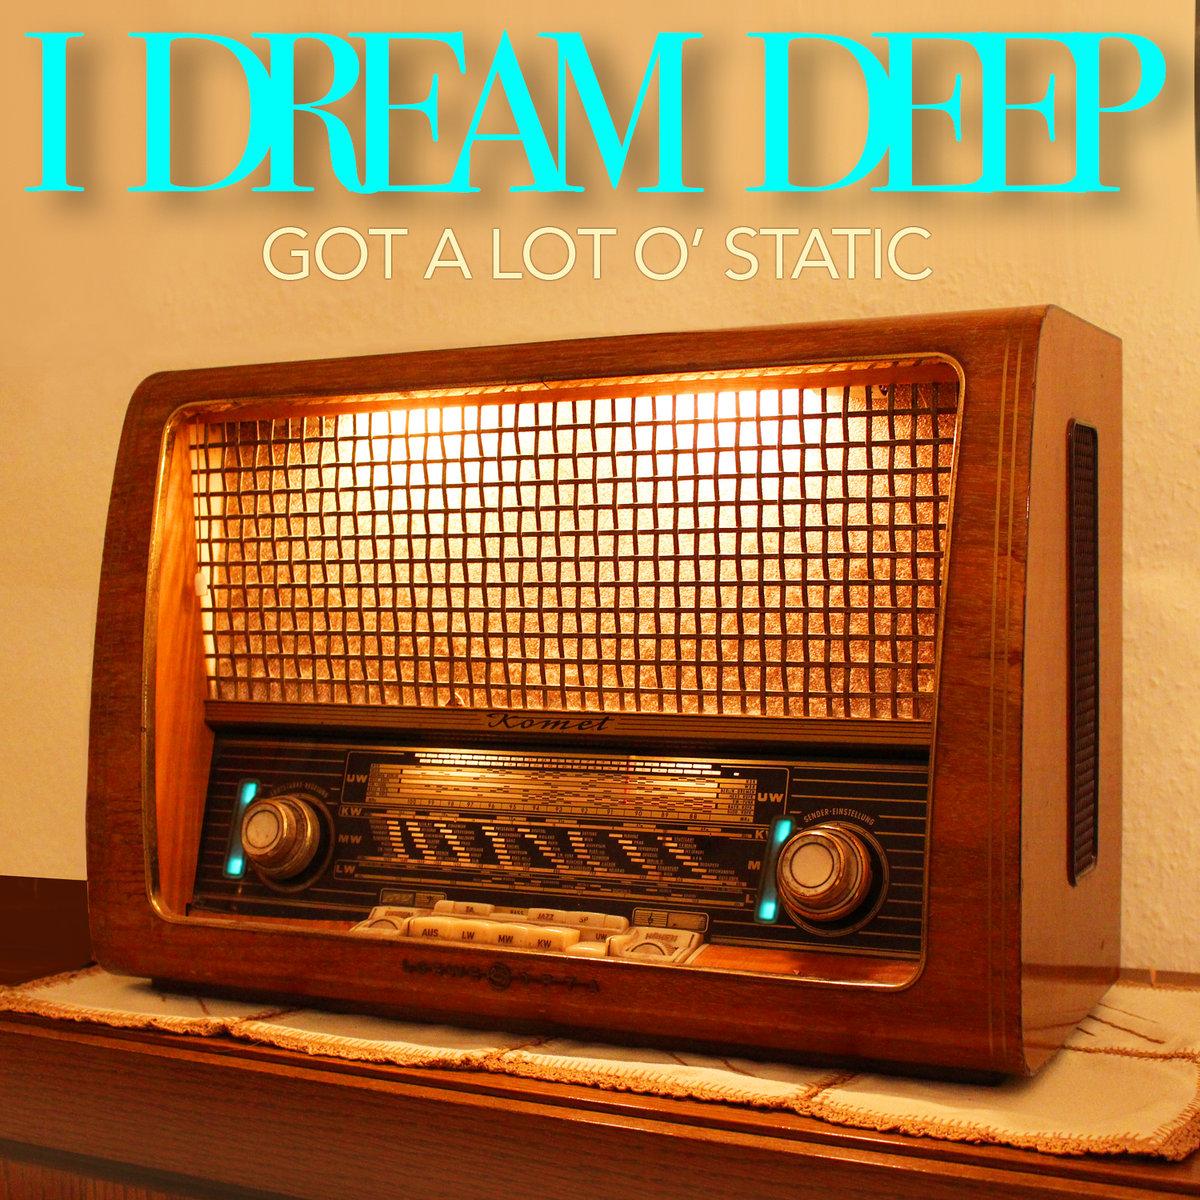 Got A Lot O' Static by I Dream Deep